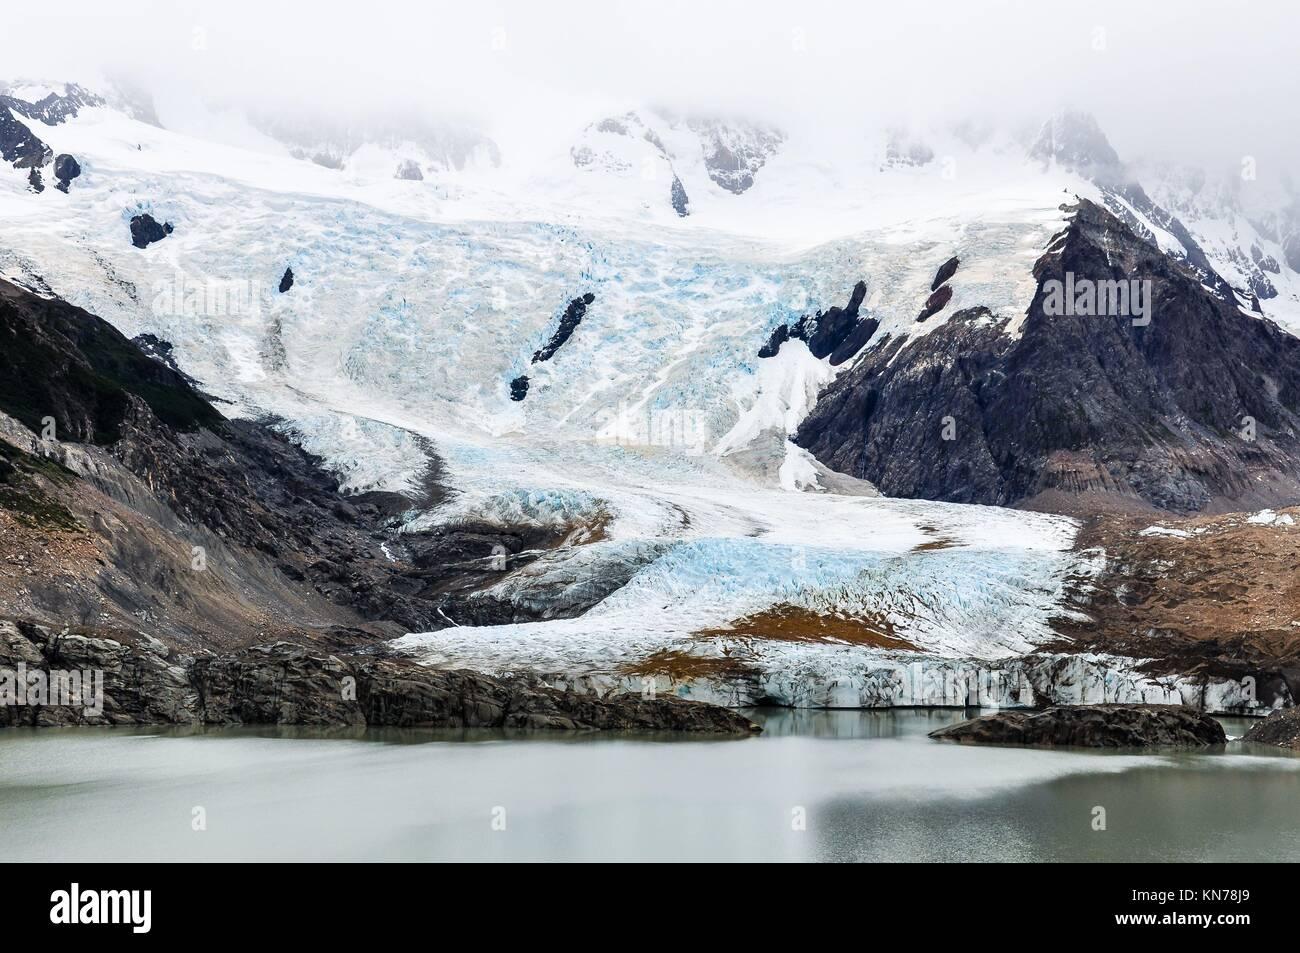 Cerro Torre Walk, El Chaltén, Patagonia, Argentina. Imagen De Stock